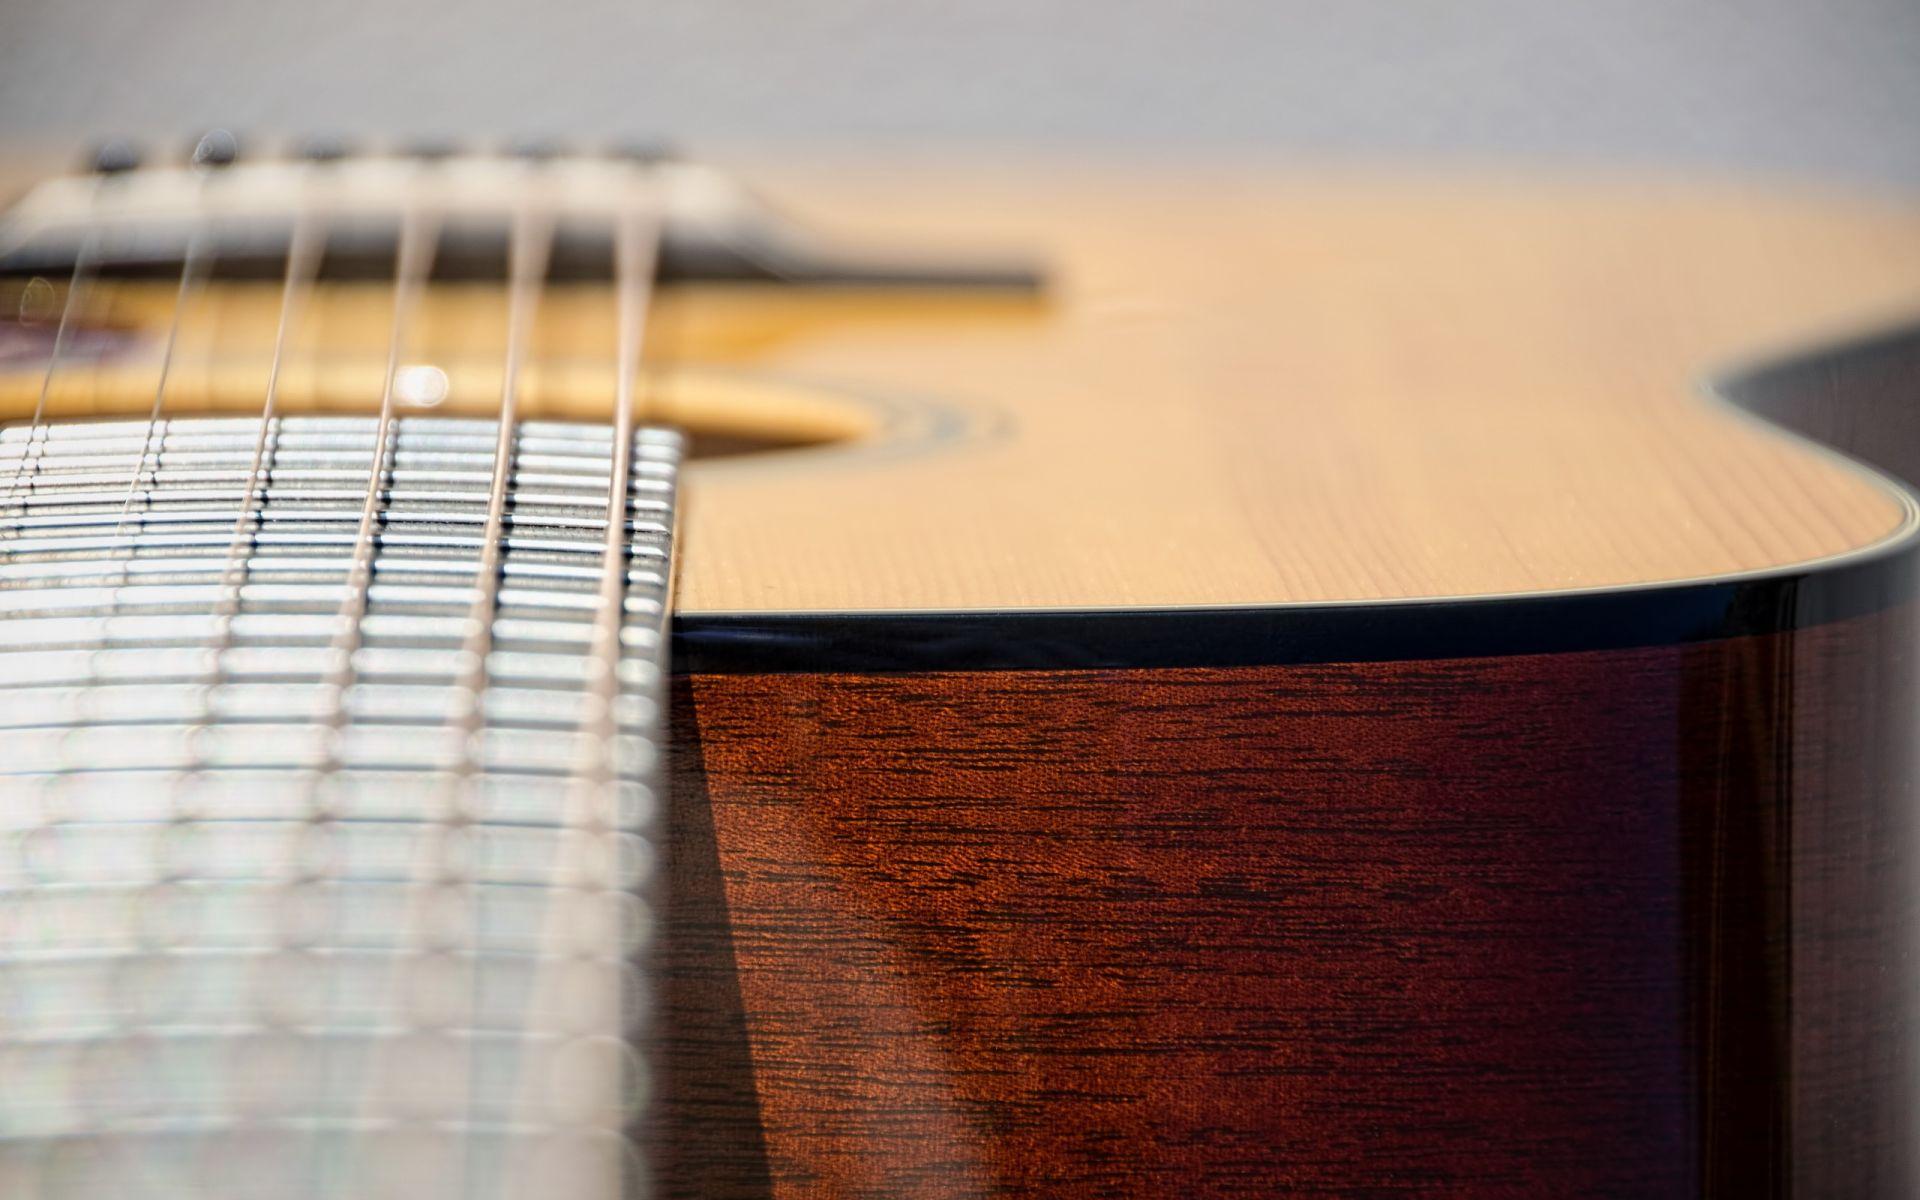 Acoustic Guitar, Picture